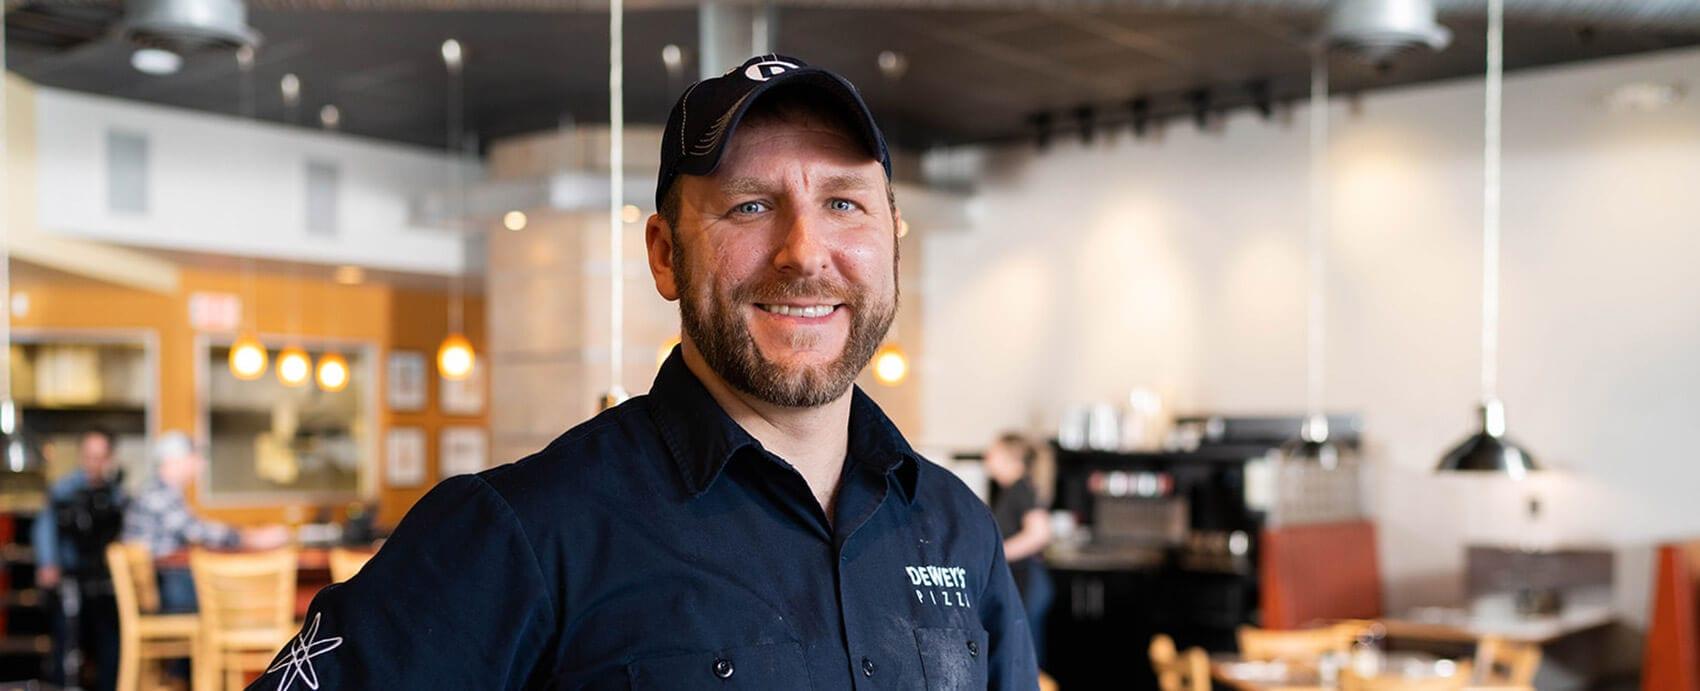 Ryan Laker - Dewey's Pizza Kitchen Innovation